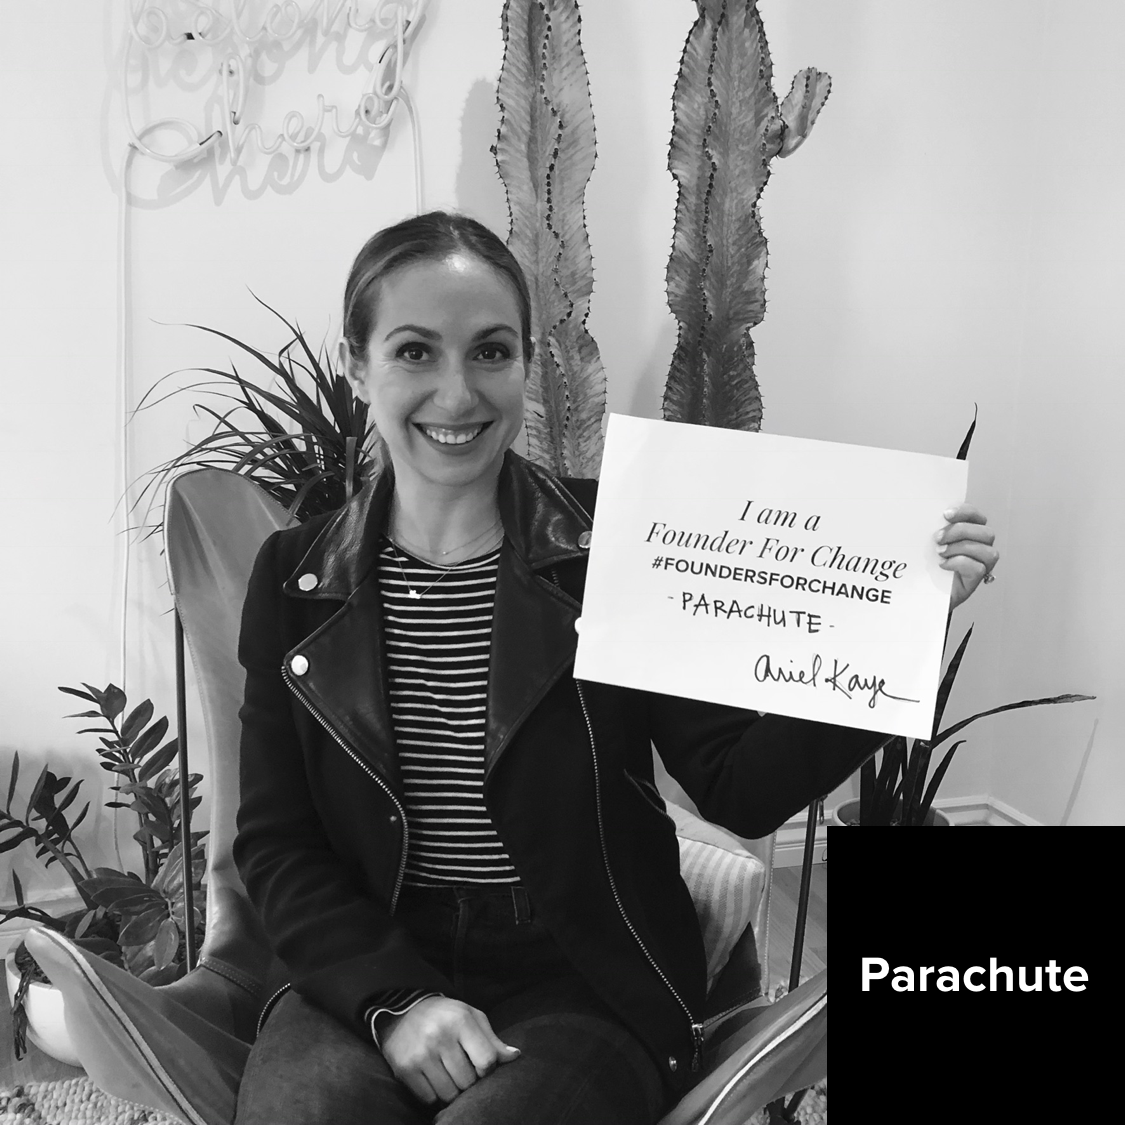 Parachute_ArielKaye.png